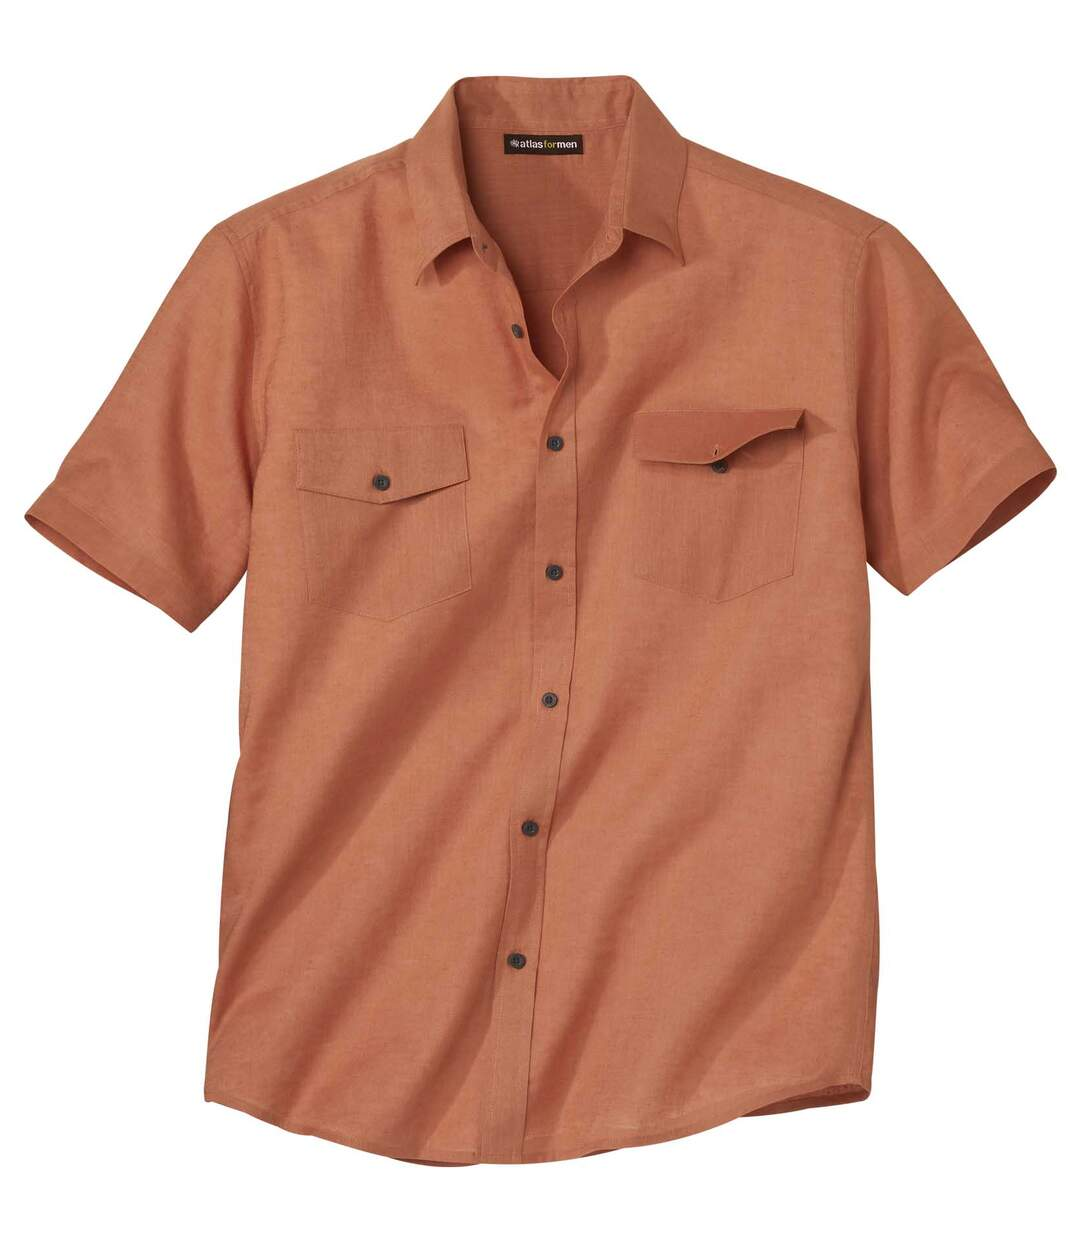 Lniano-bawełniana letnia koszula Atlas For Men